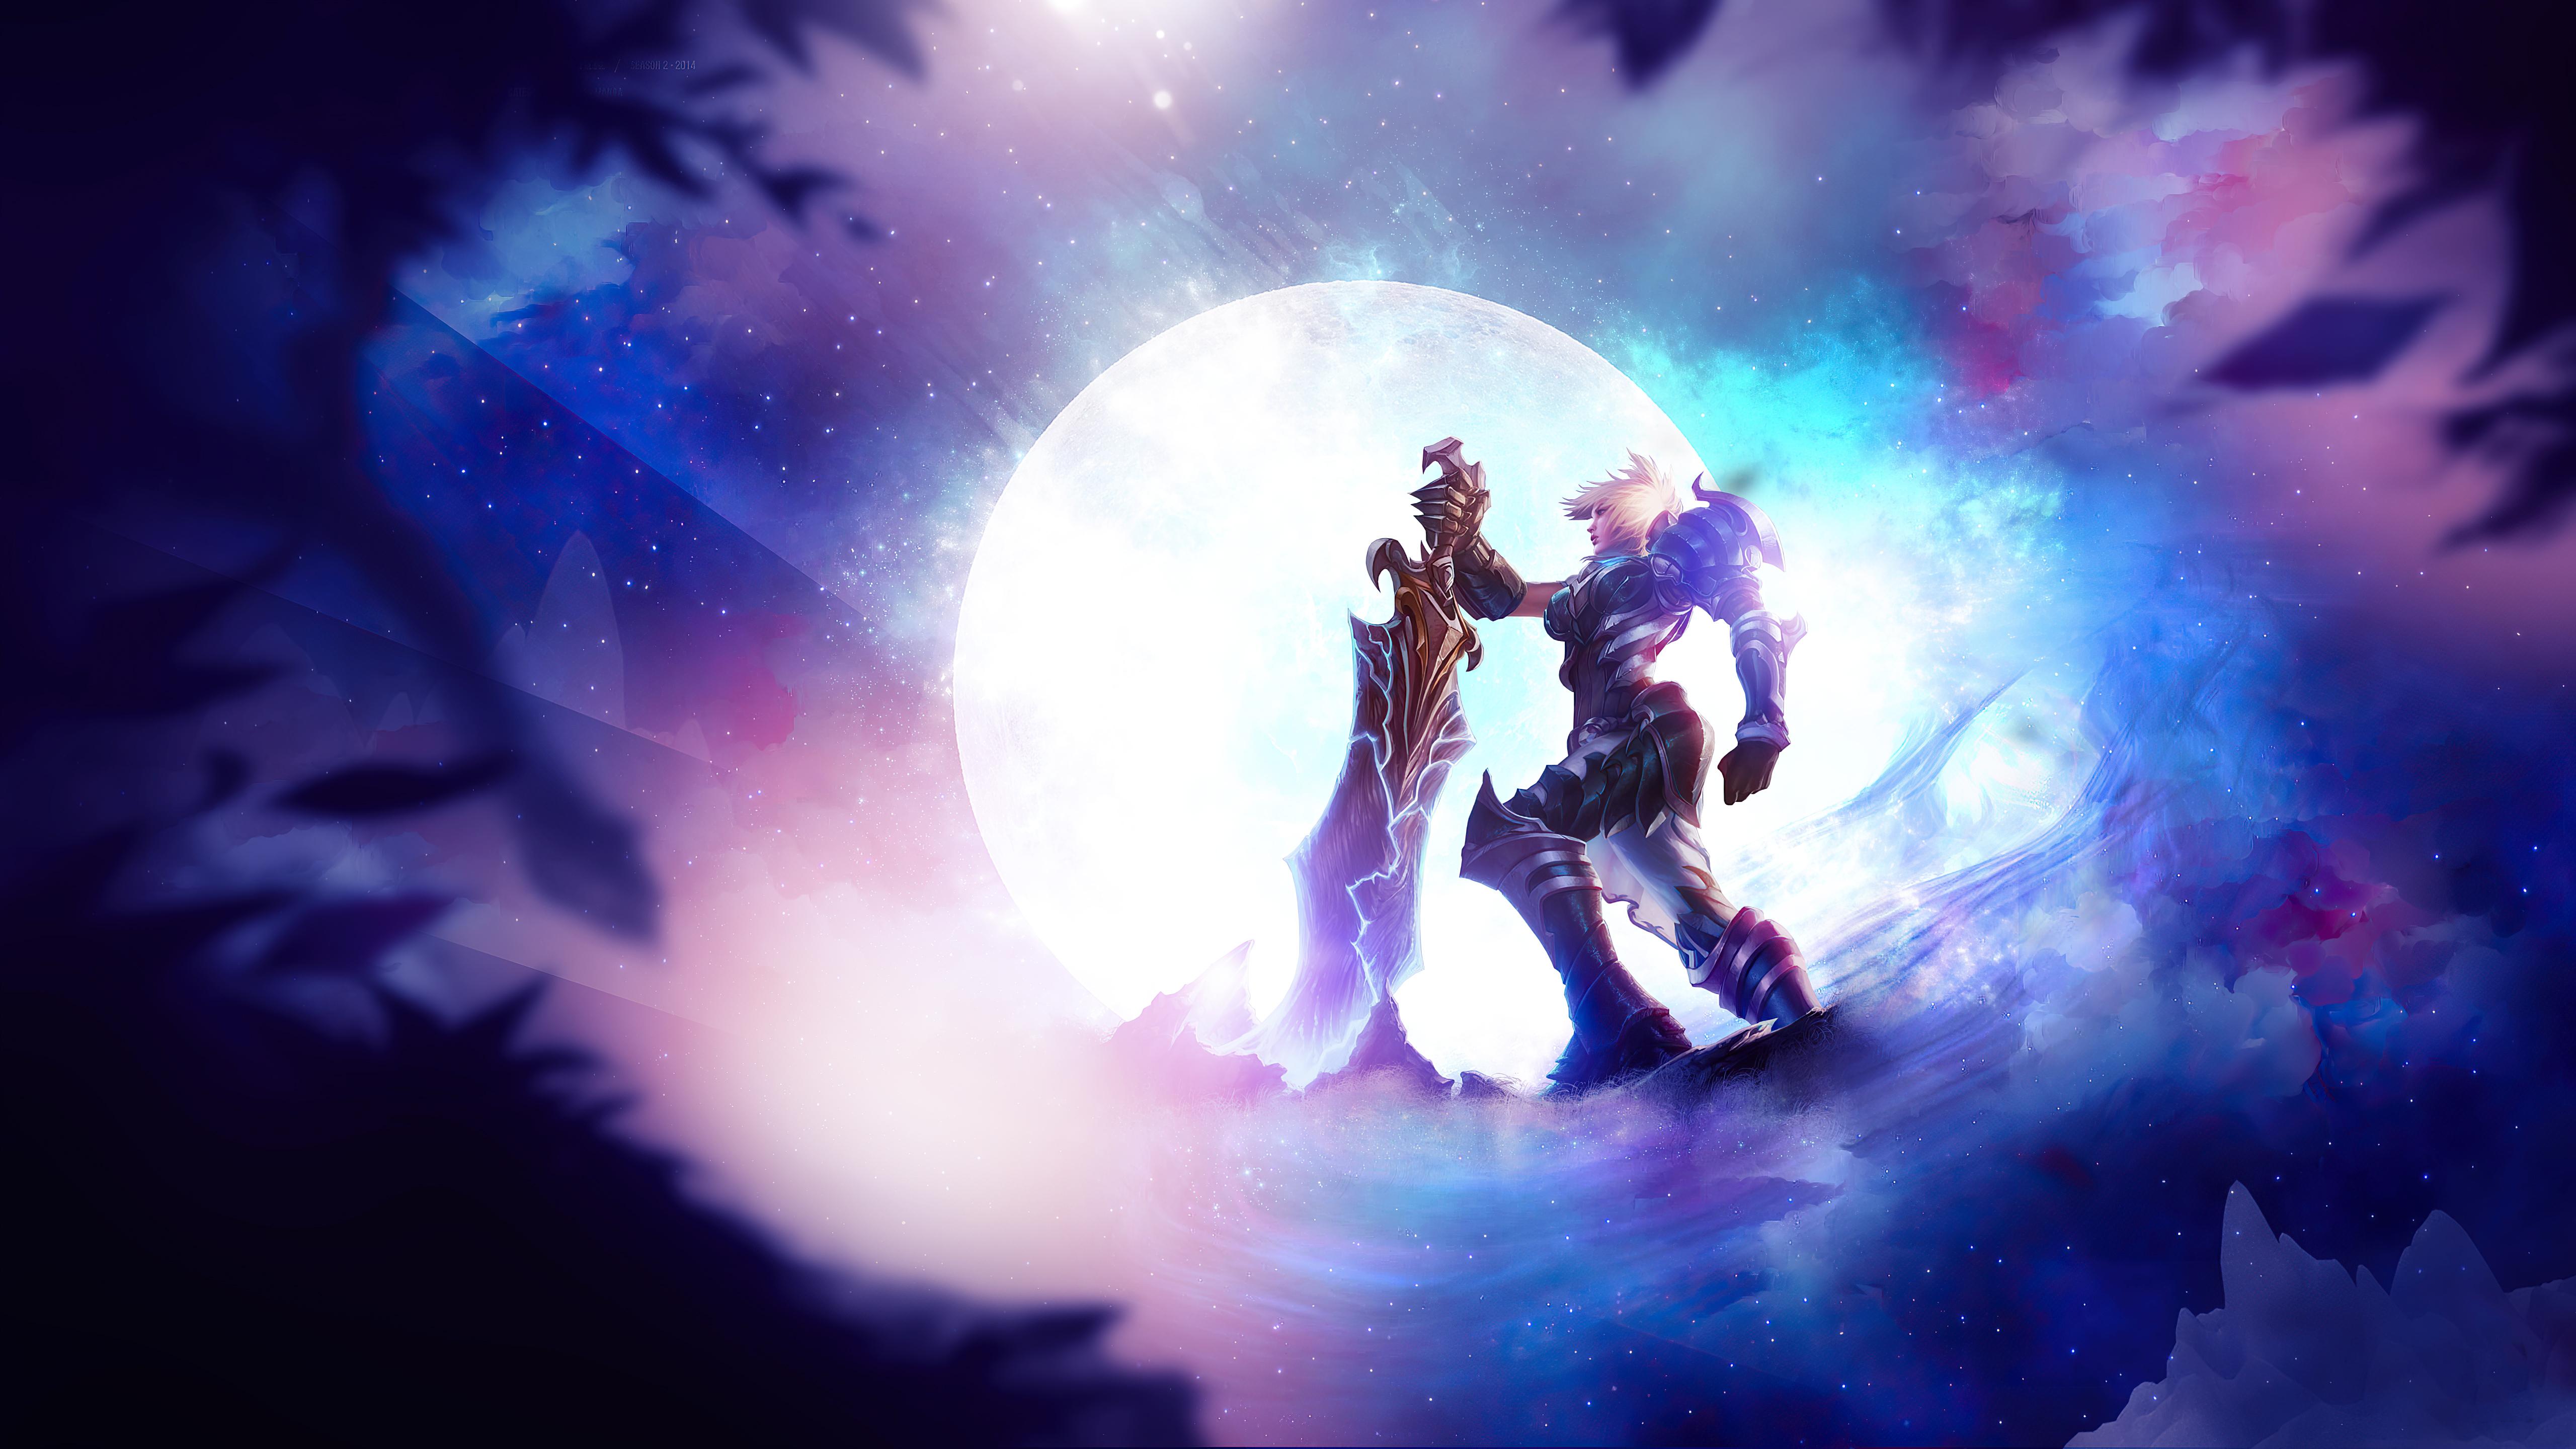 Girl League Of Legends Moon Riven League Of Legends Sword Woman Warrior 5120x2880